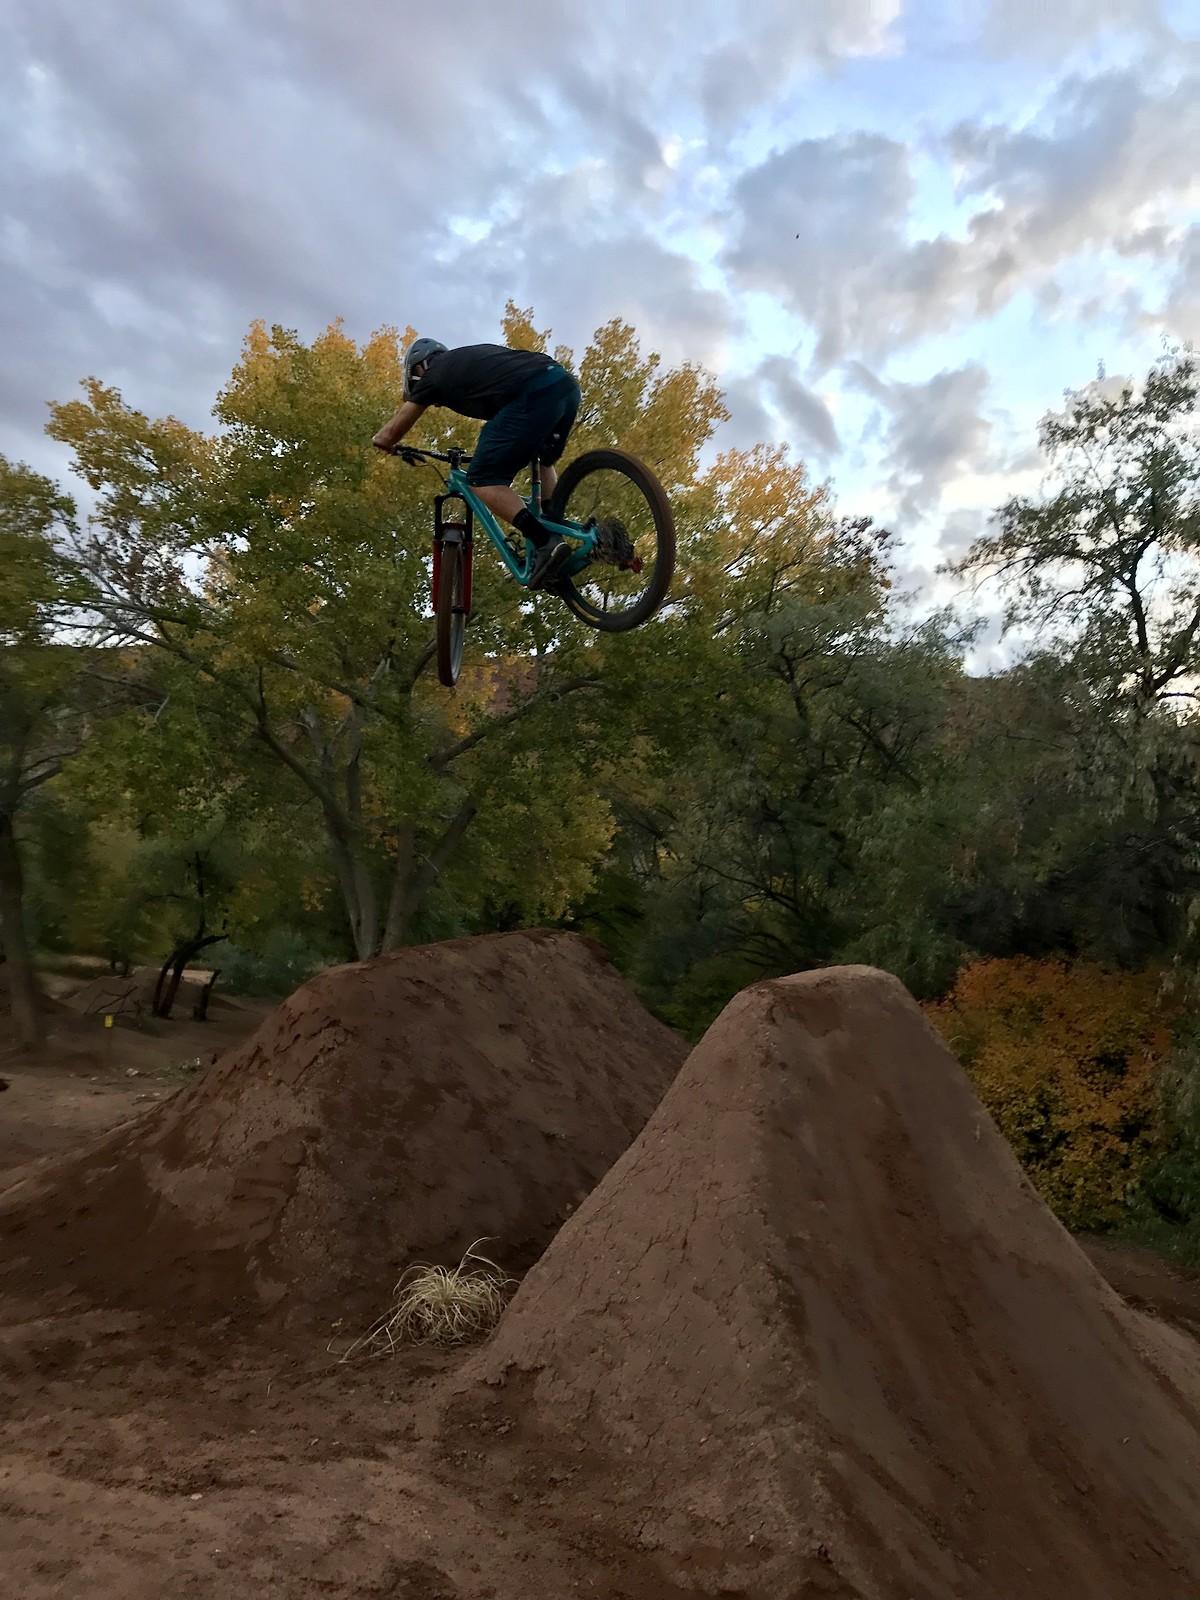 IMG 3943 - FlowyMcFlowerton - Mountain Biking Pictures - Vital MTB